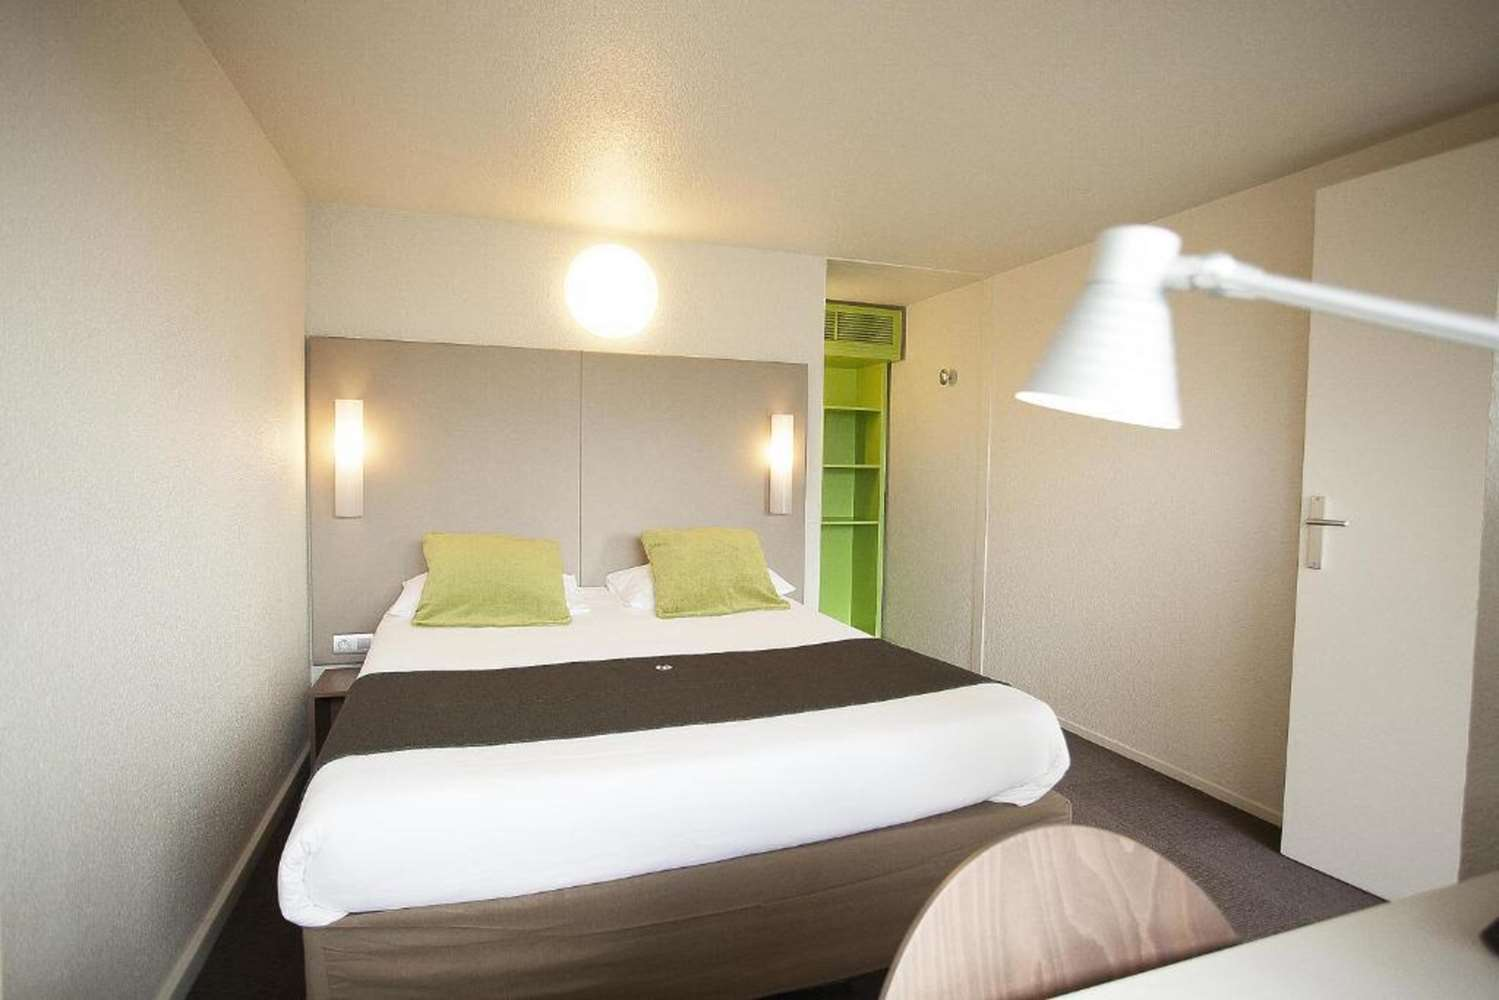 HOTEL CAMPANILE GRASSE - Chateauneuf